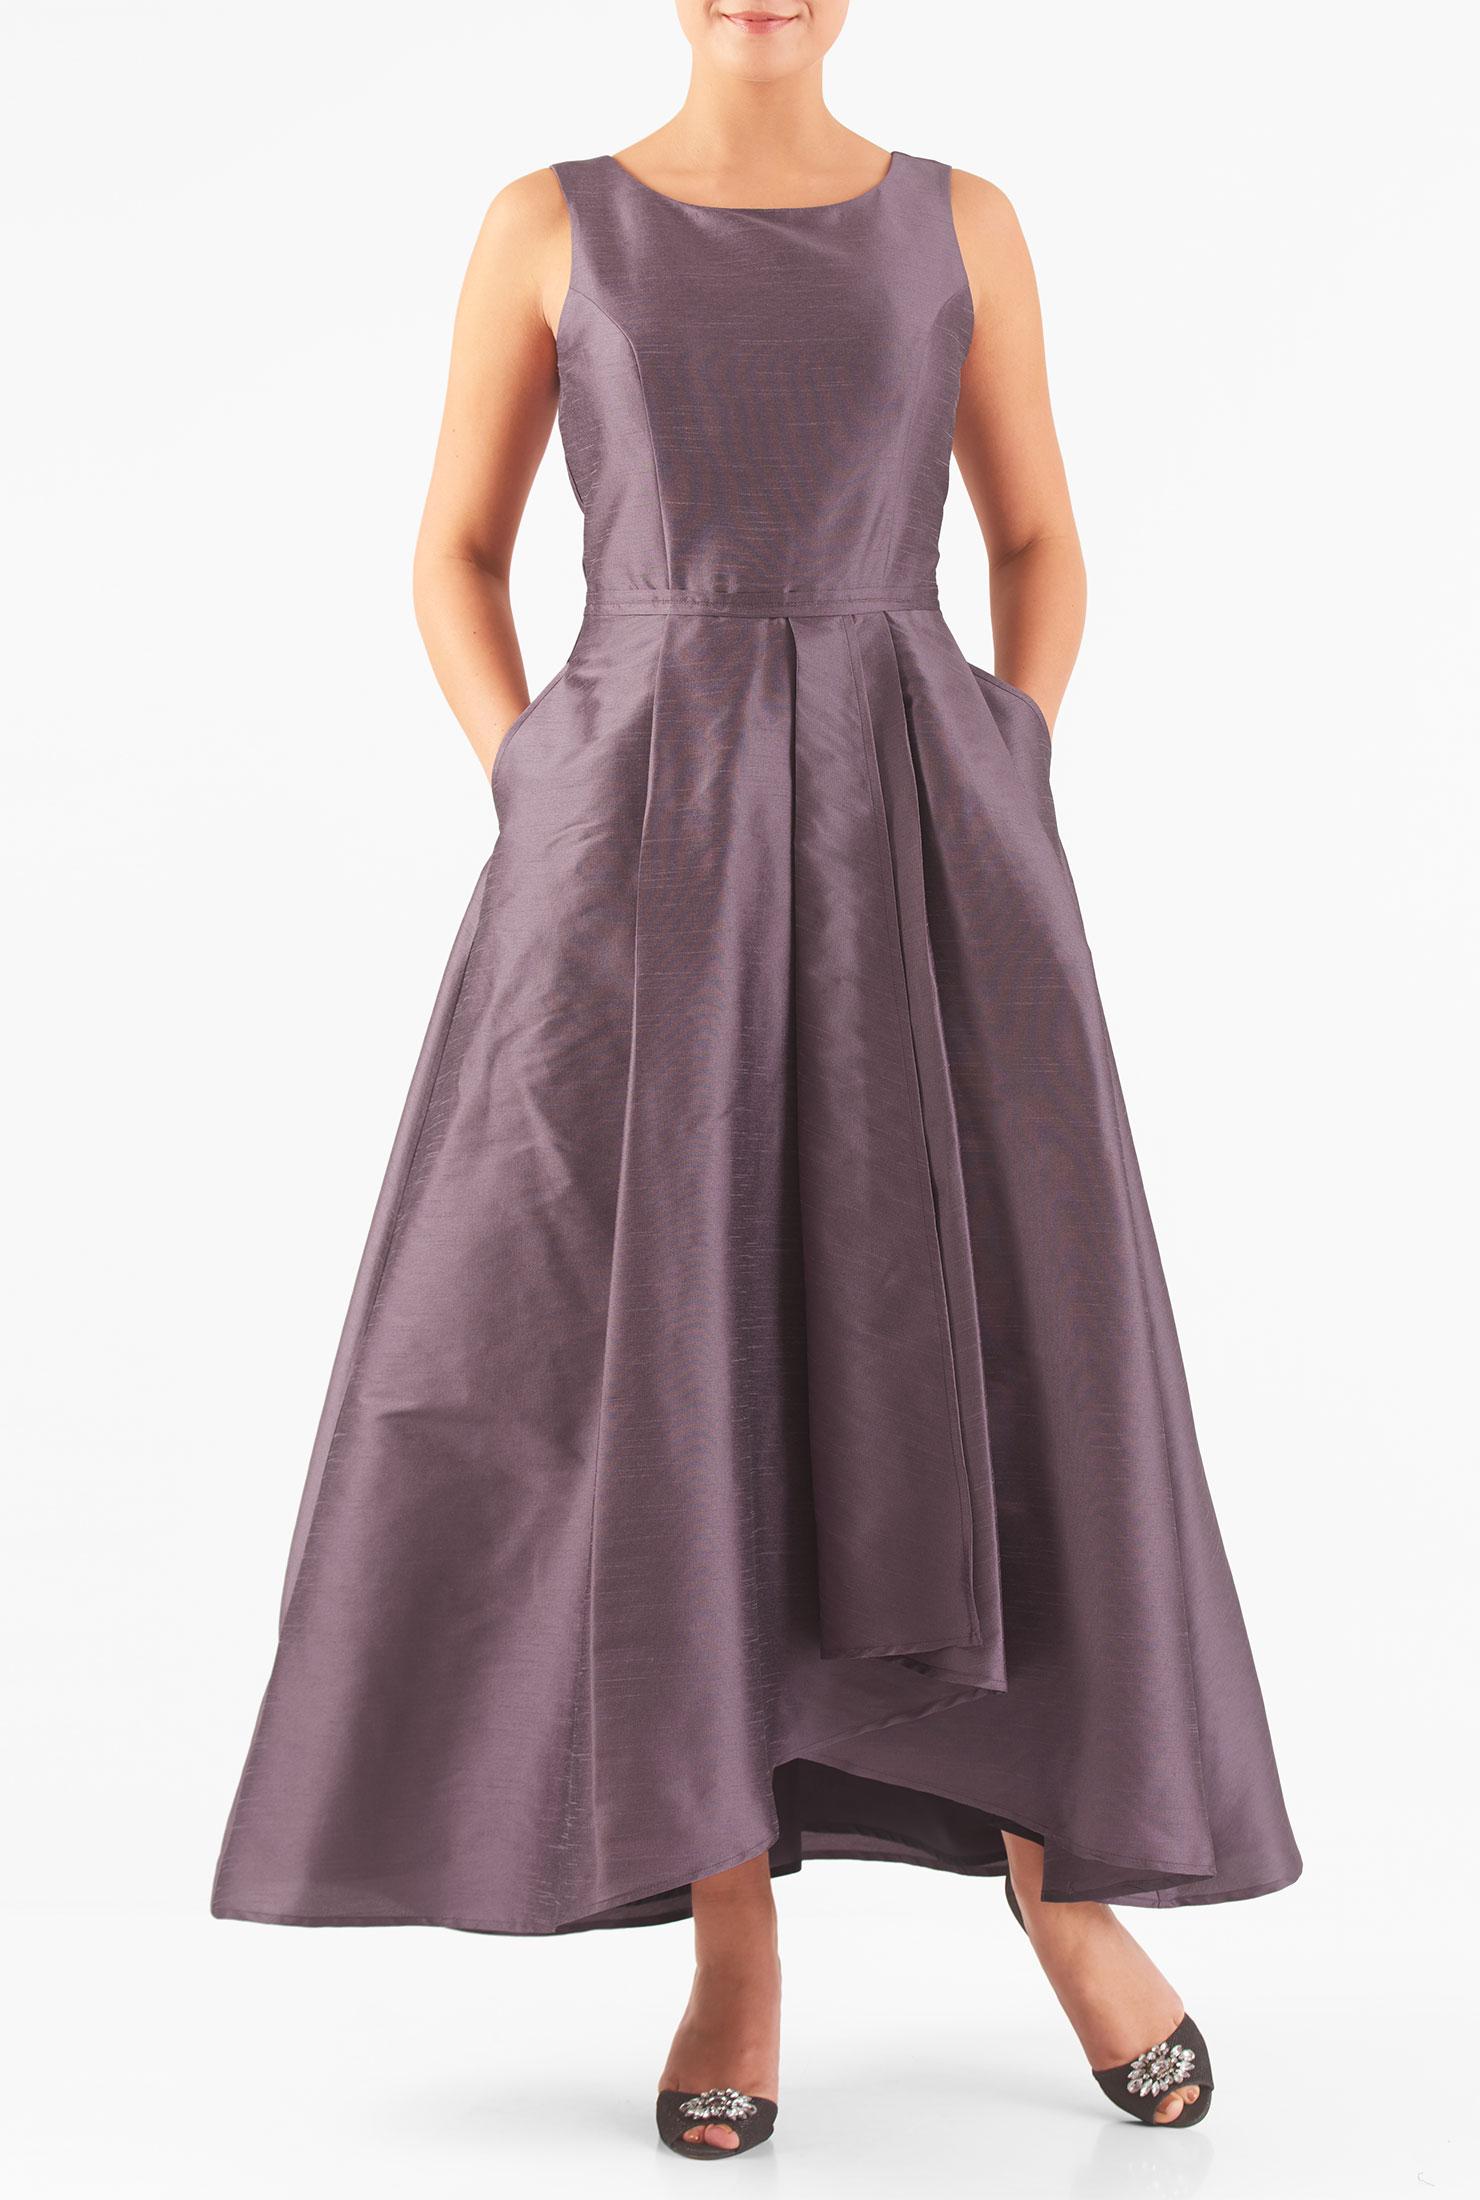 Store eshakti the best selection and prices in fashion eshakti womens asymmetric wrap skirted dupioni dress ombrellifo Choice Image